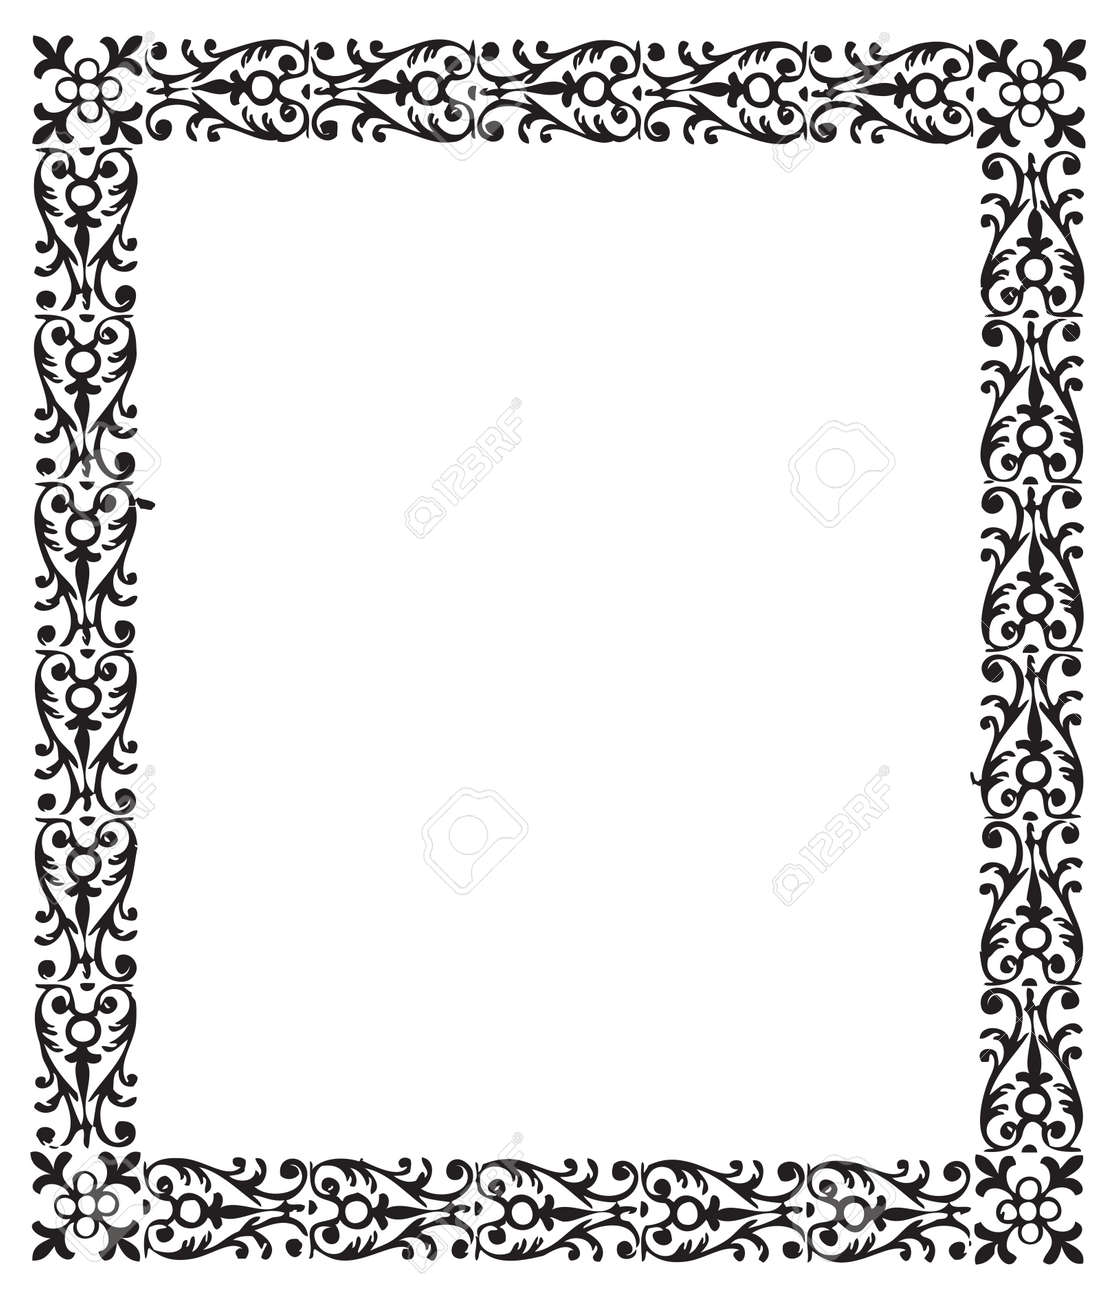 Vintage engraving frame with floral decorations - 52891680